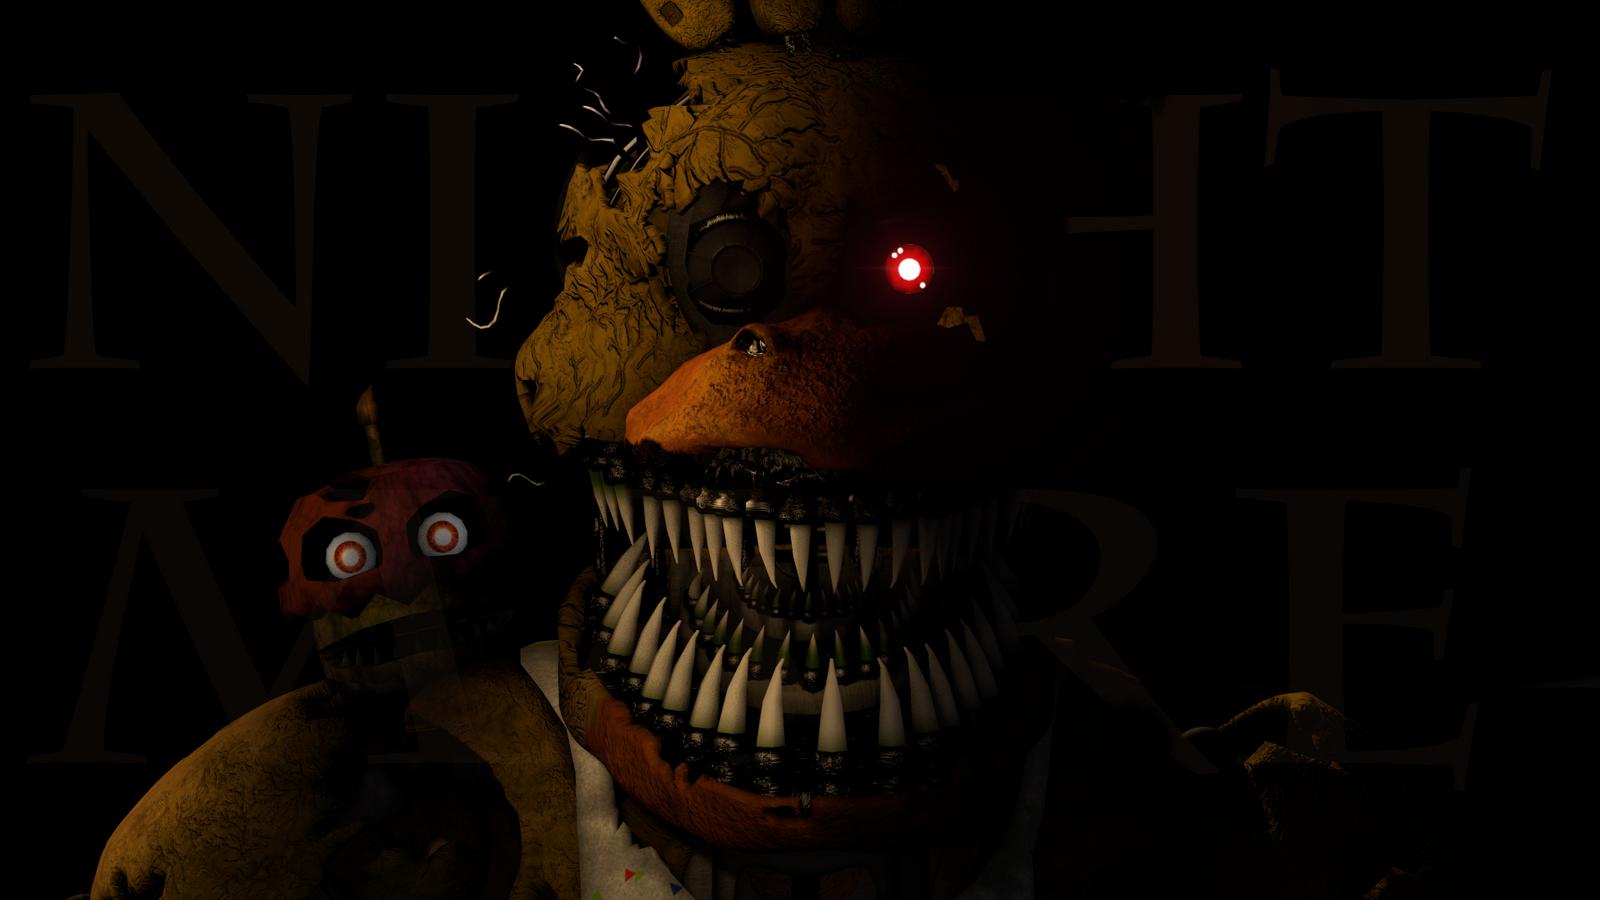 remake of the nightmare - photo #43